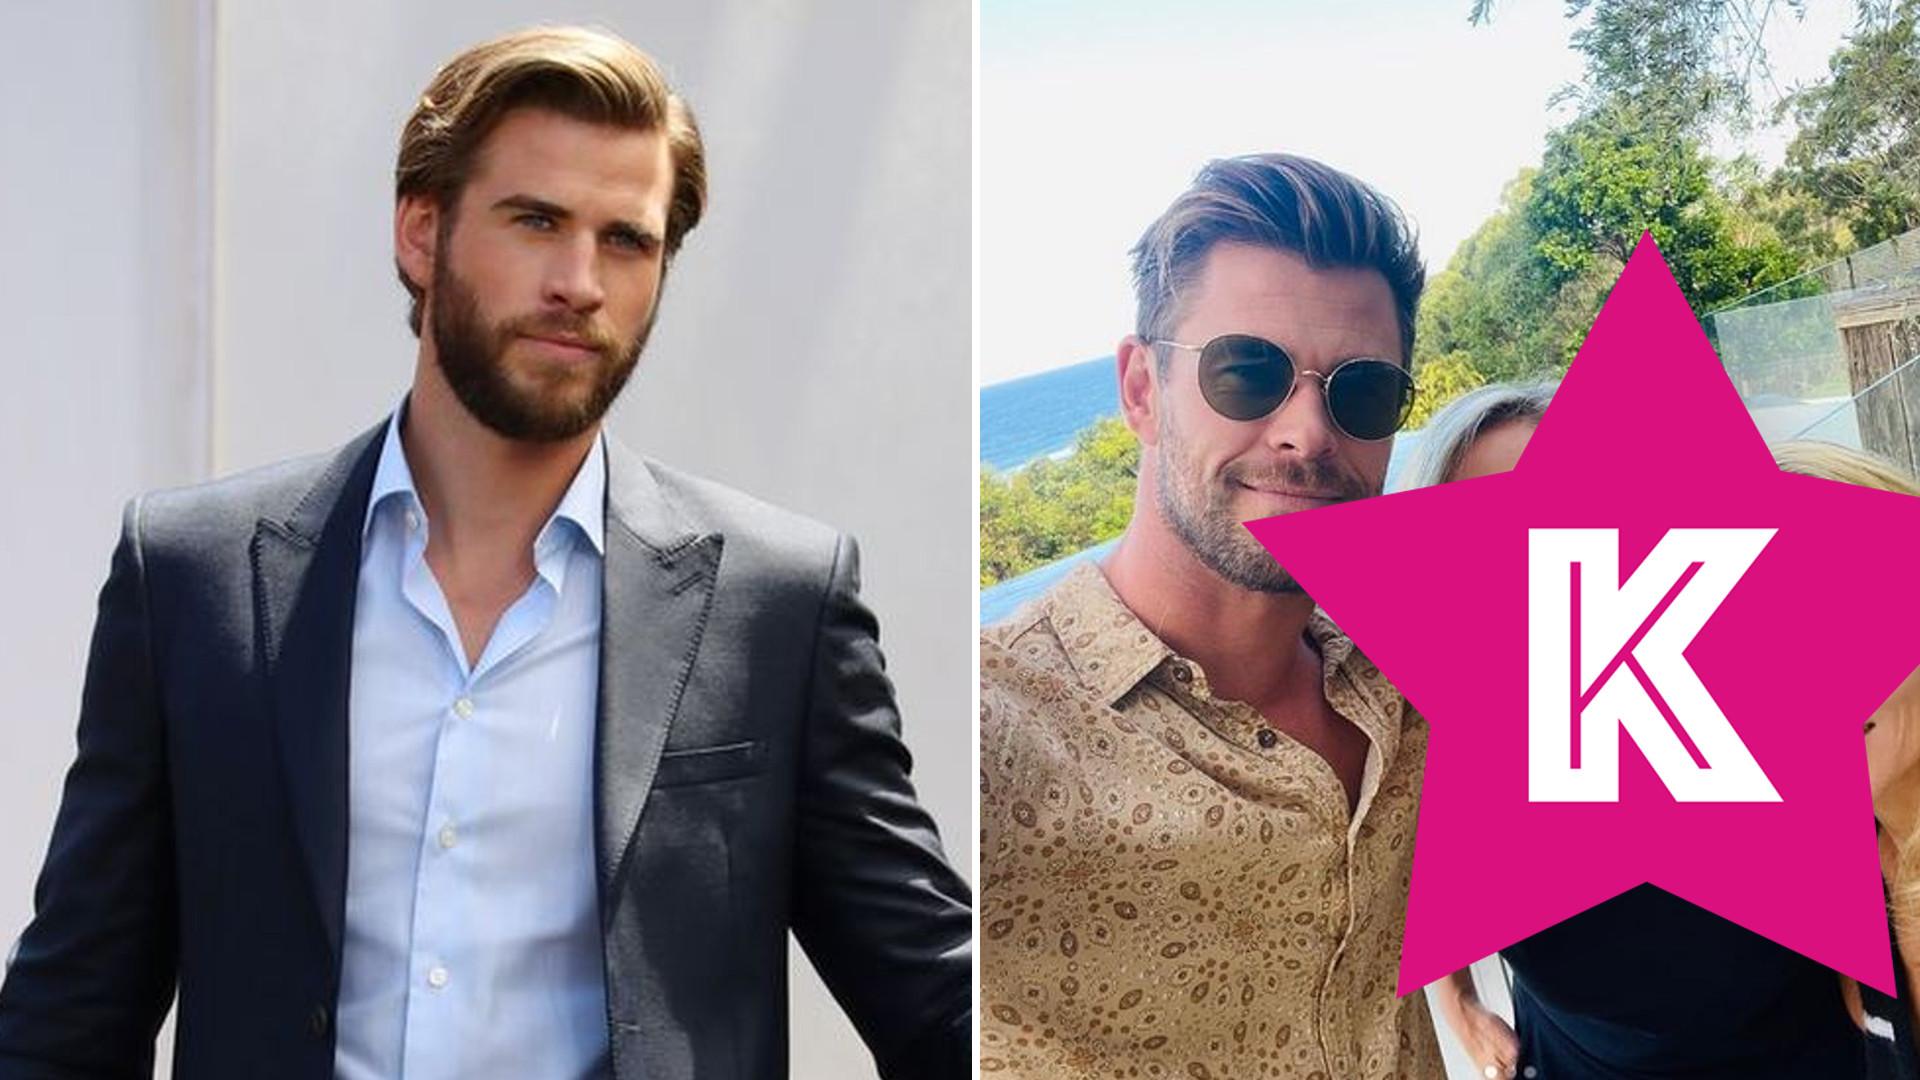 Mama Liama i Chrisa Hemswortha wygląda jak ich SIOSTRA, a ma 60 lat!